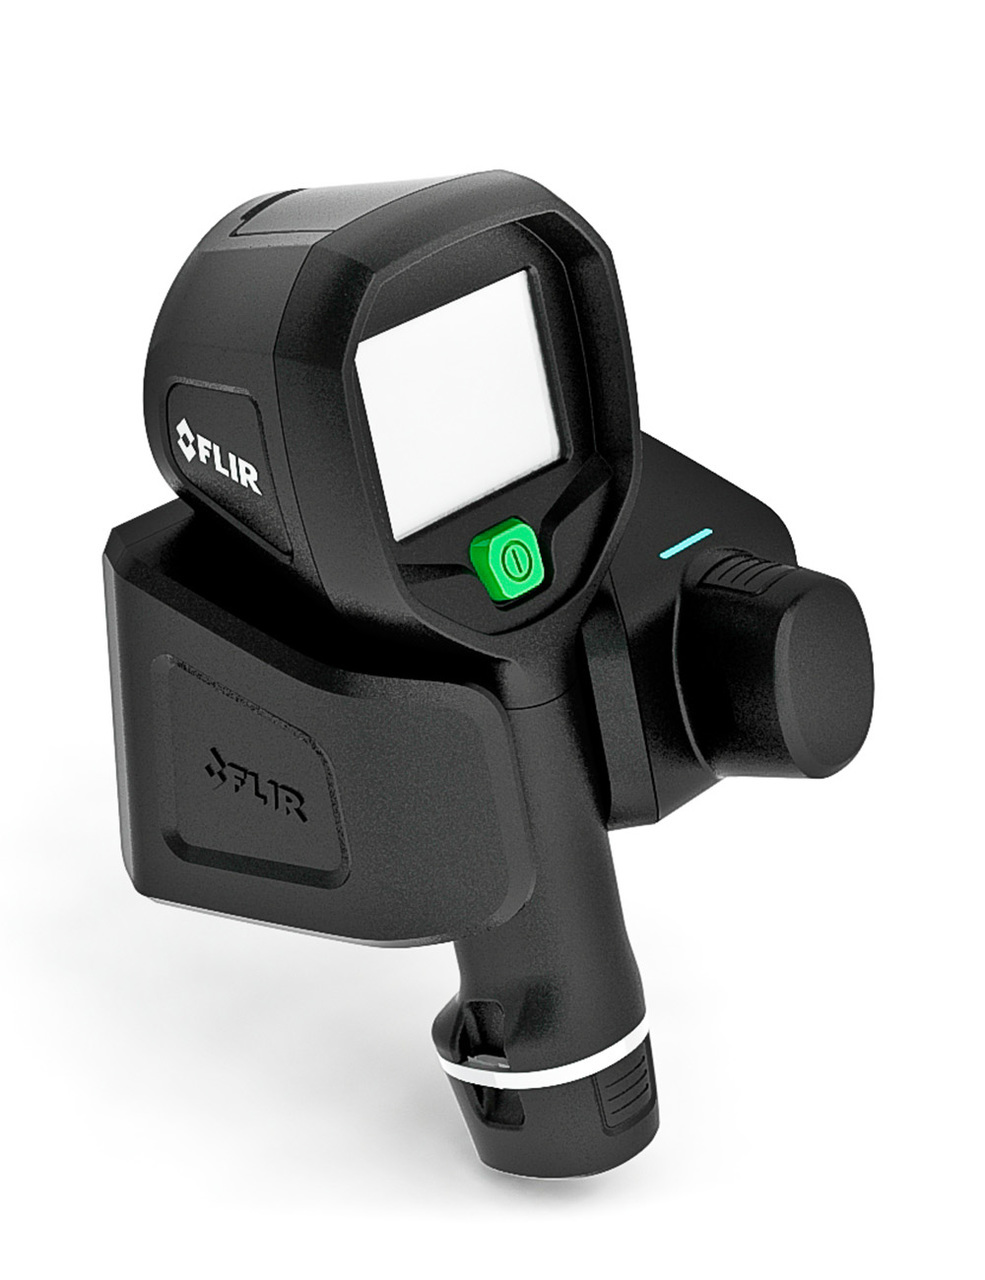 FLIR® T199368ACC Rechargeable Battery, Lithium-Ion, 4.4 Ah Nominal Capacity, 3 v Nominal, 4.3 X 2.4 X 1.8 in, For FLIR K45, FLIR K55, FLIR K65 IR Cameras and Thermometers